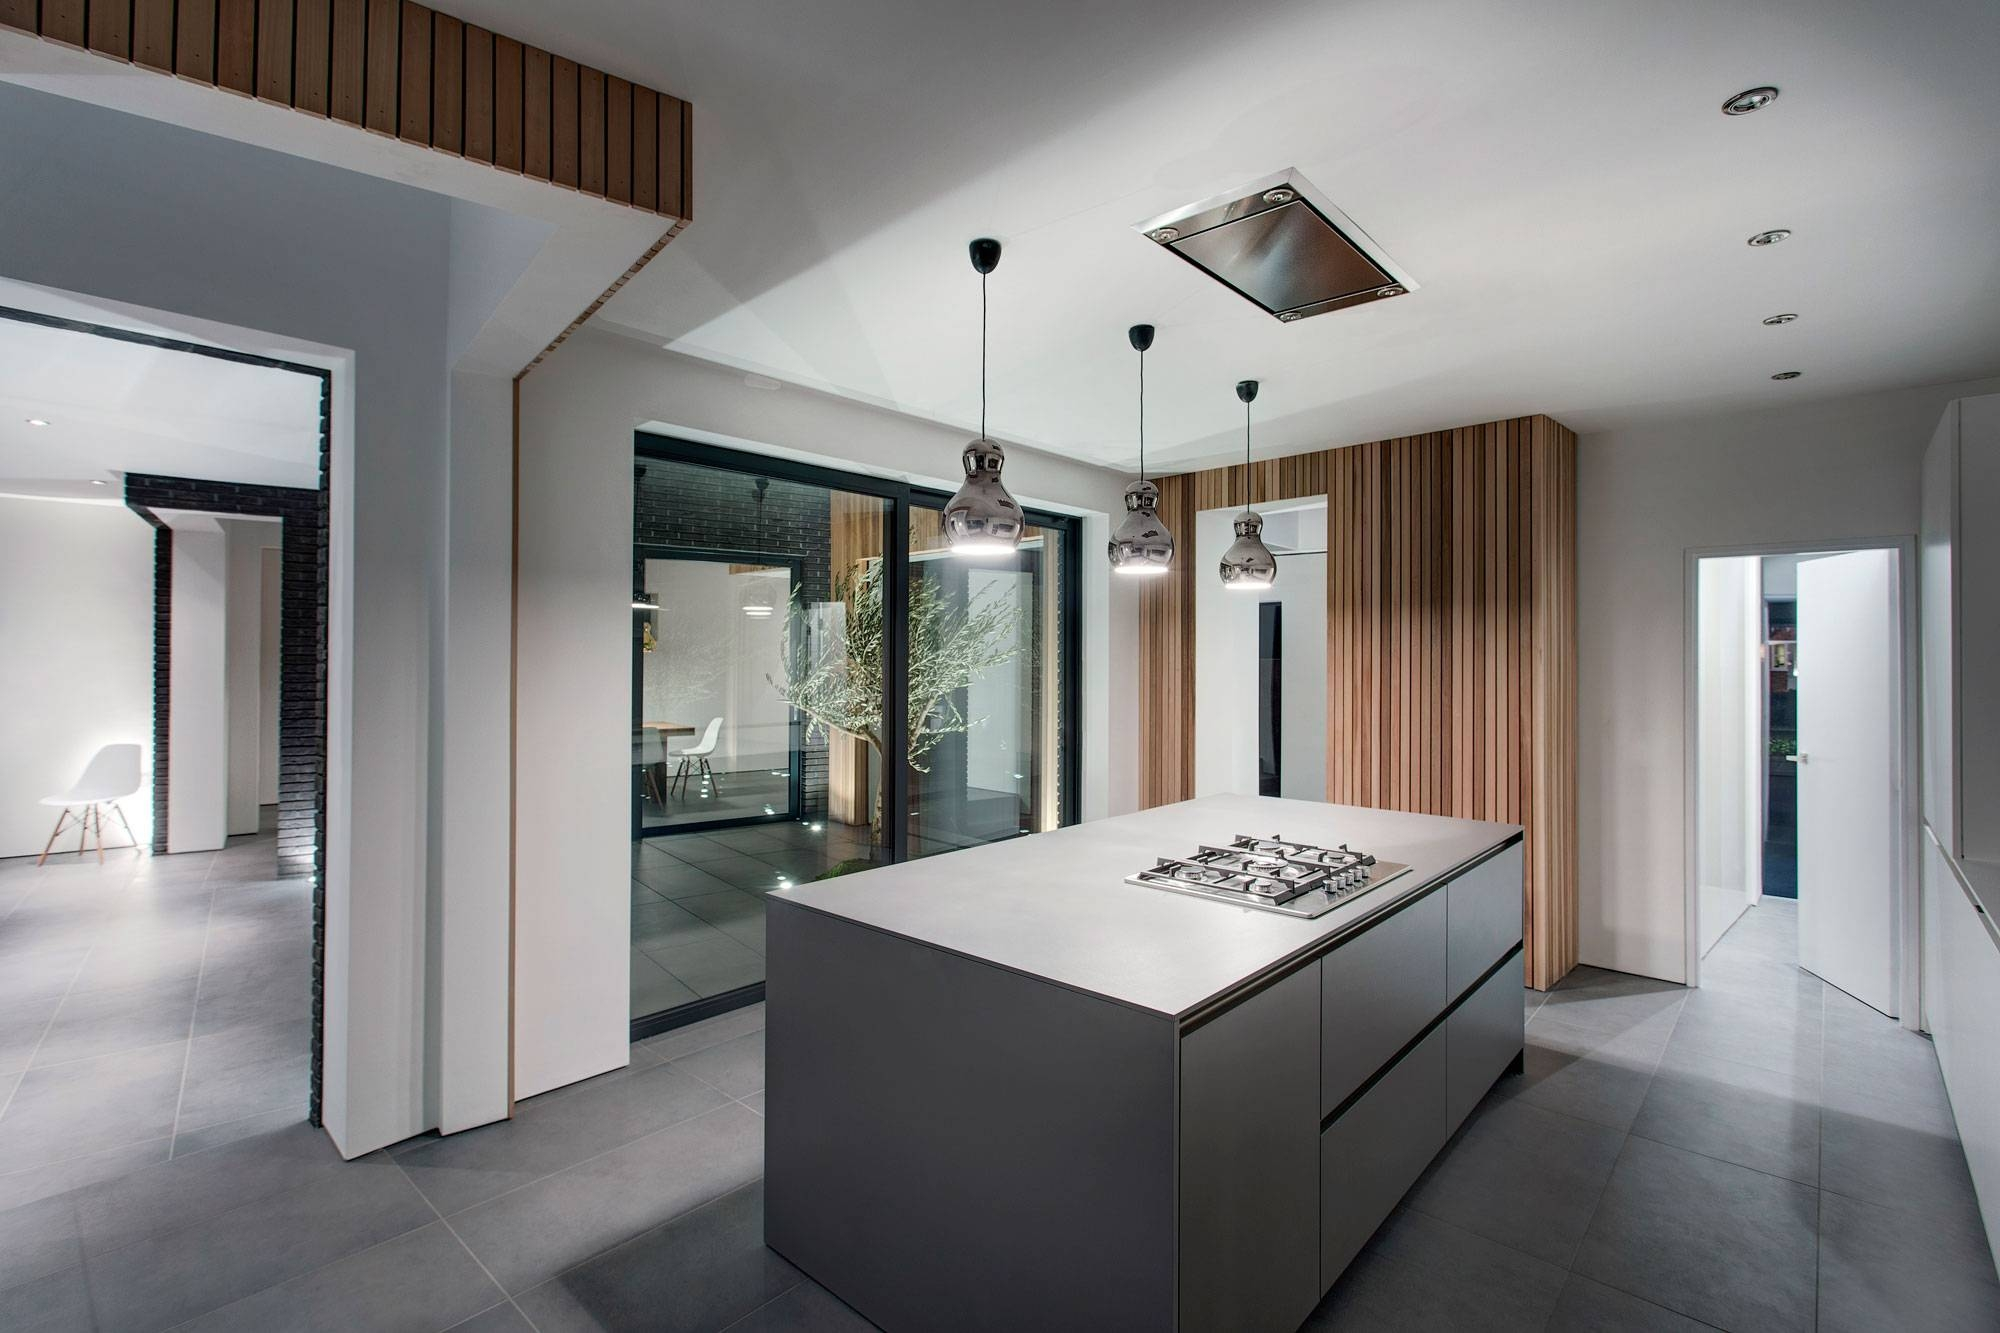 Brilliant Modern Kitchen Pendant Lighting In House Design Ideas With Regard To Modern Pendant Lights Sydney (View 7 of 15)